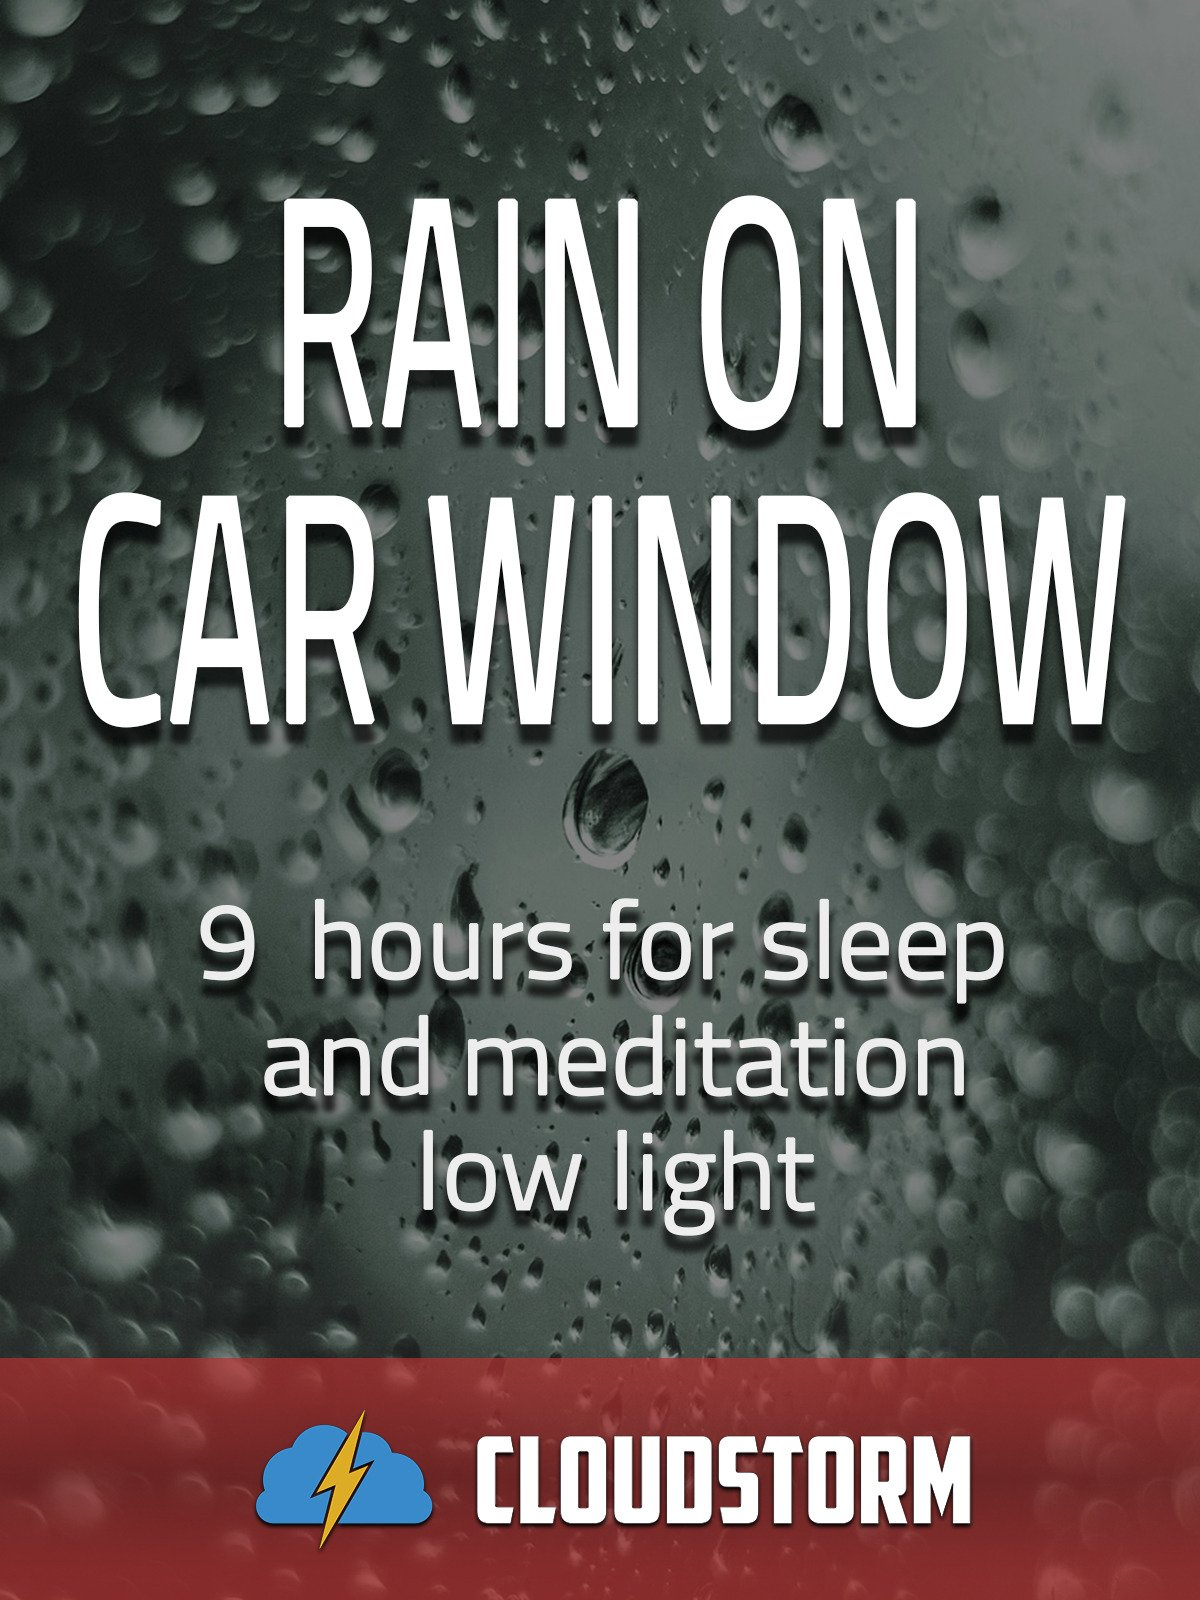 Rain on car window, 9 hours for Sleep and Meditation, low light